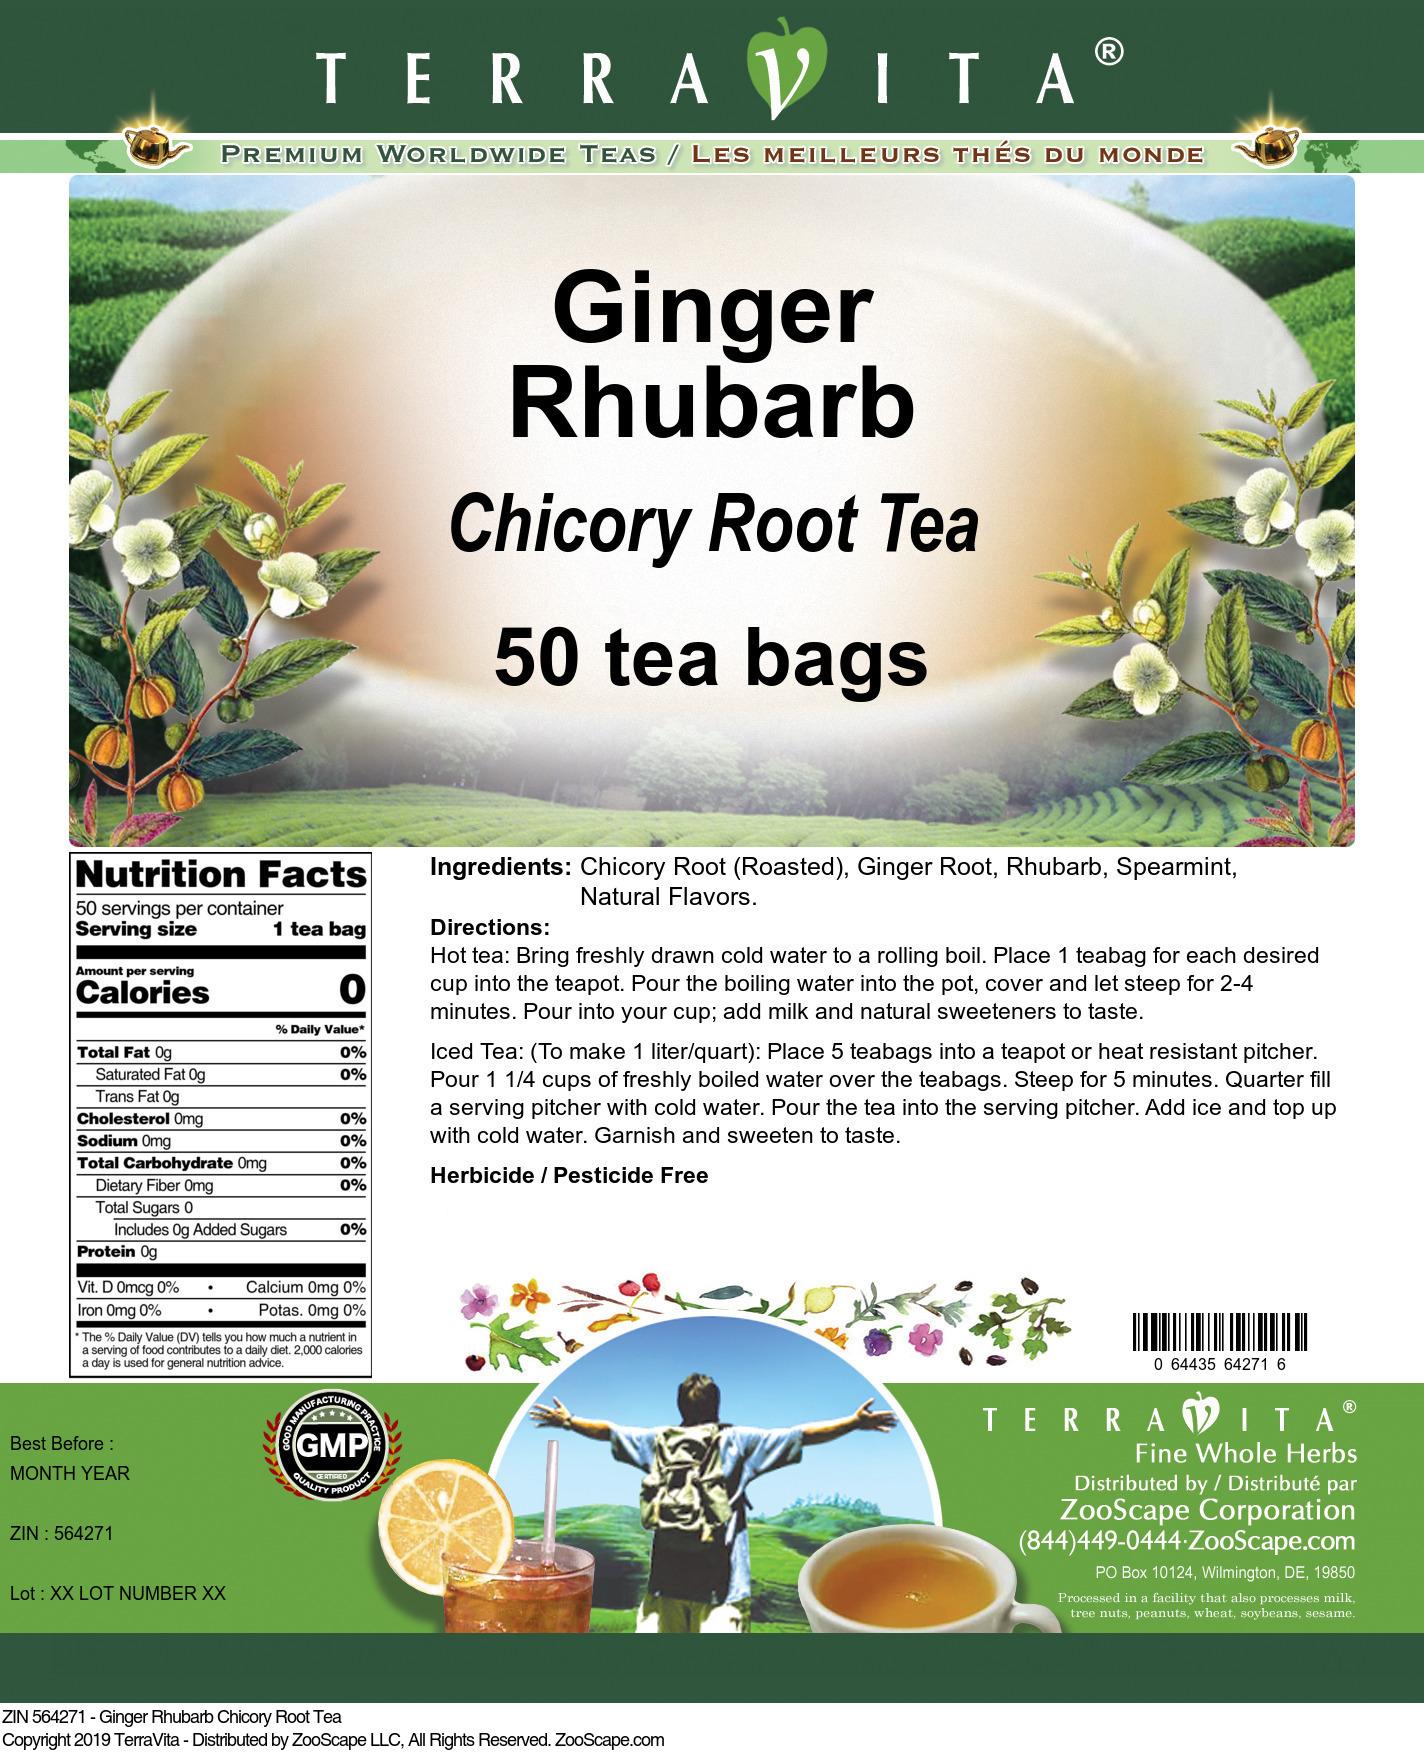 Ginger Rhubarb Chicory Root